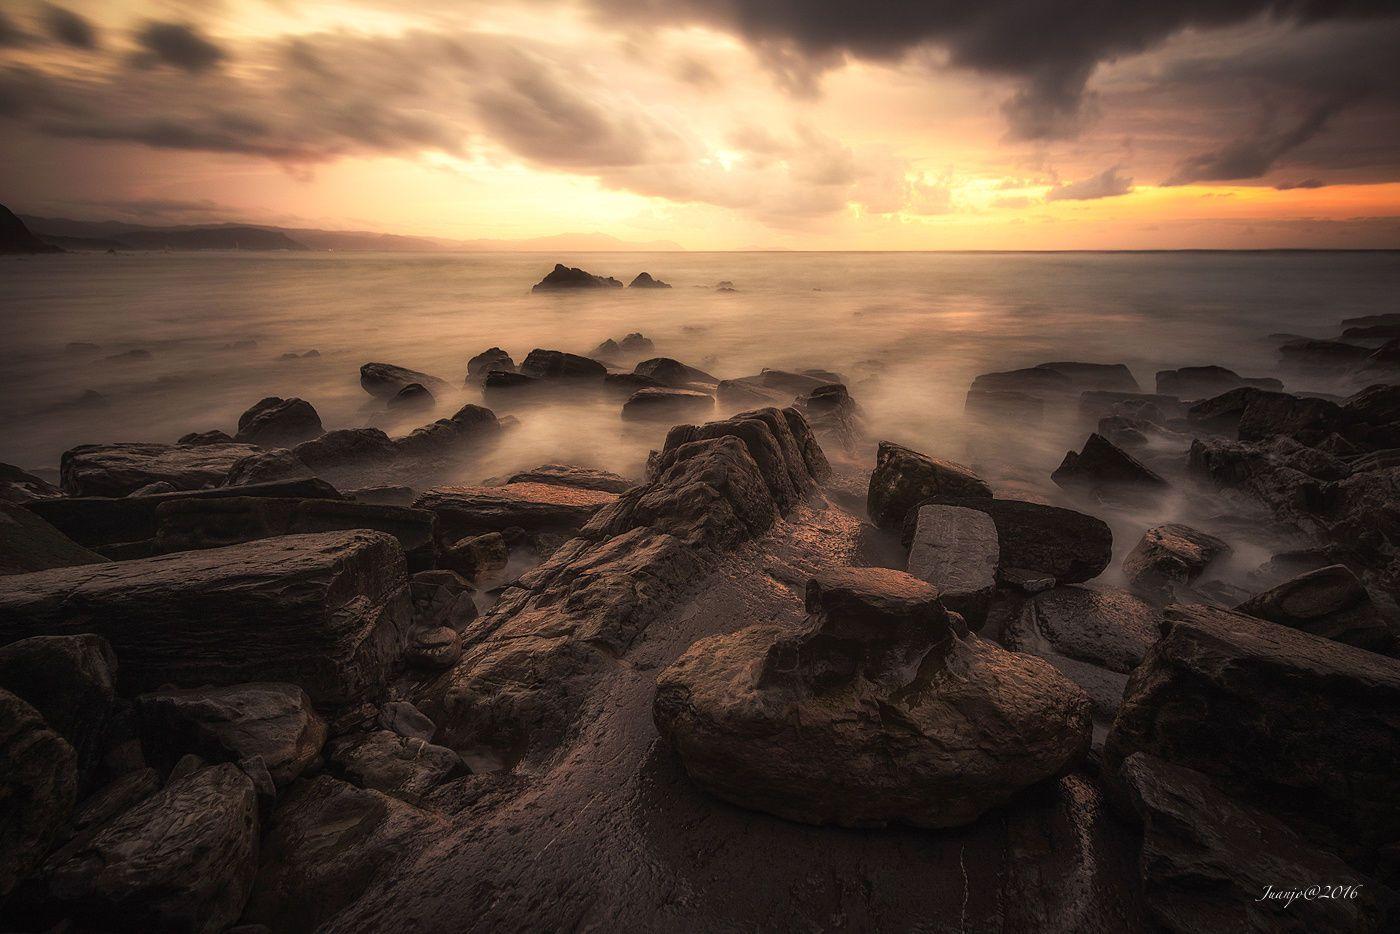 Sunrise colors  Landscapes photo by juanjobasurto2 http://rarme.com/?F9gZi